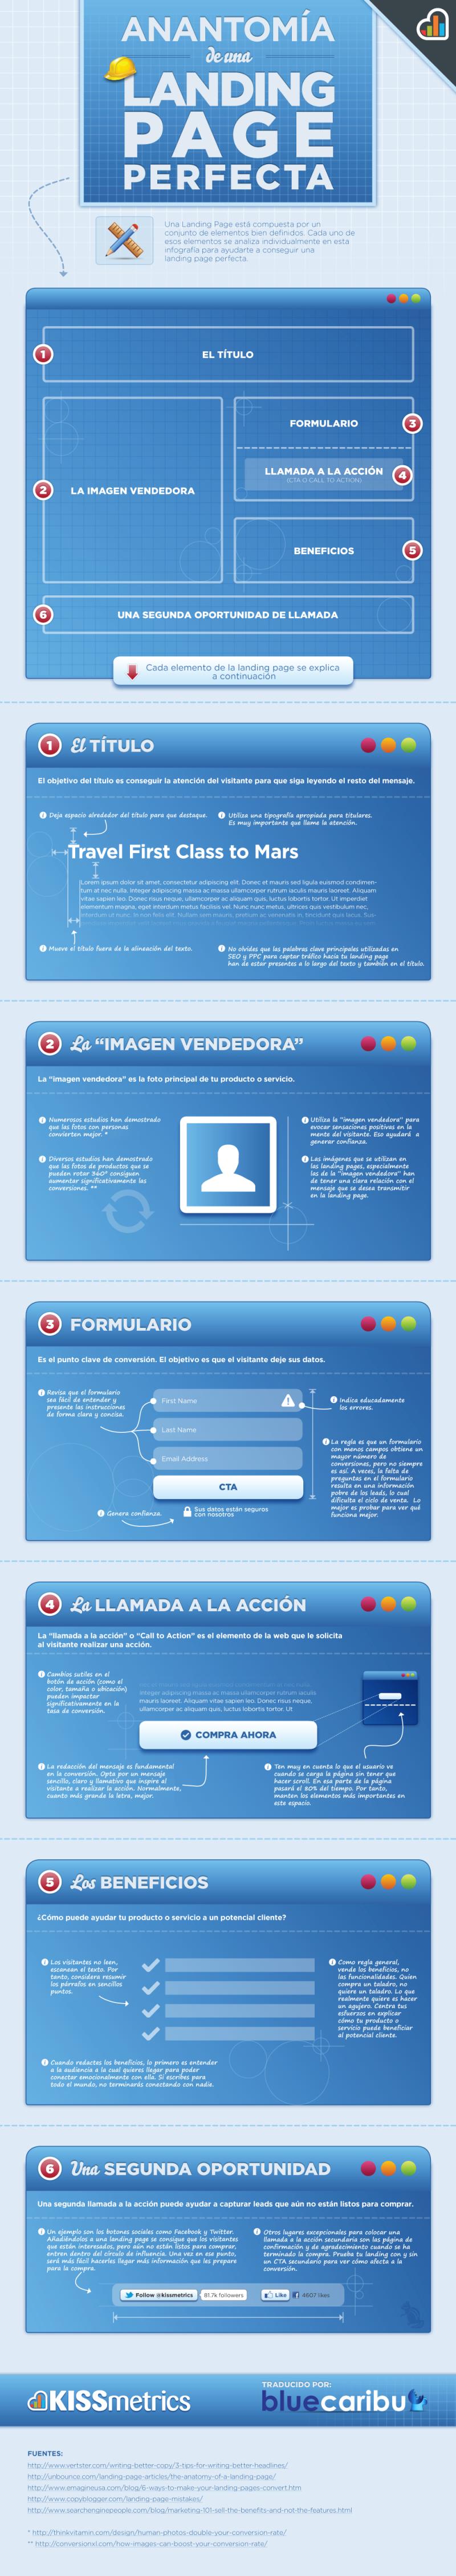 Anatomia de una Landing Page Perfecta - blog hostalia hosting